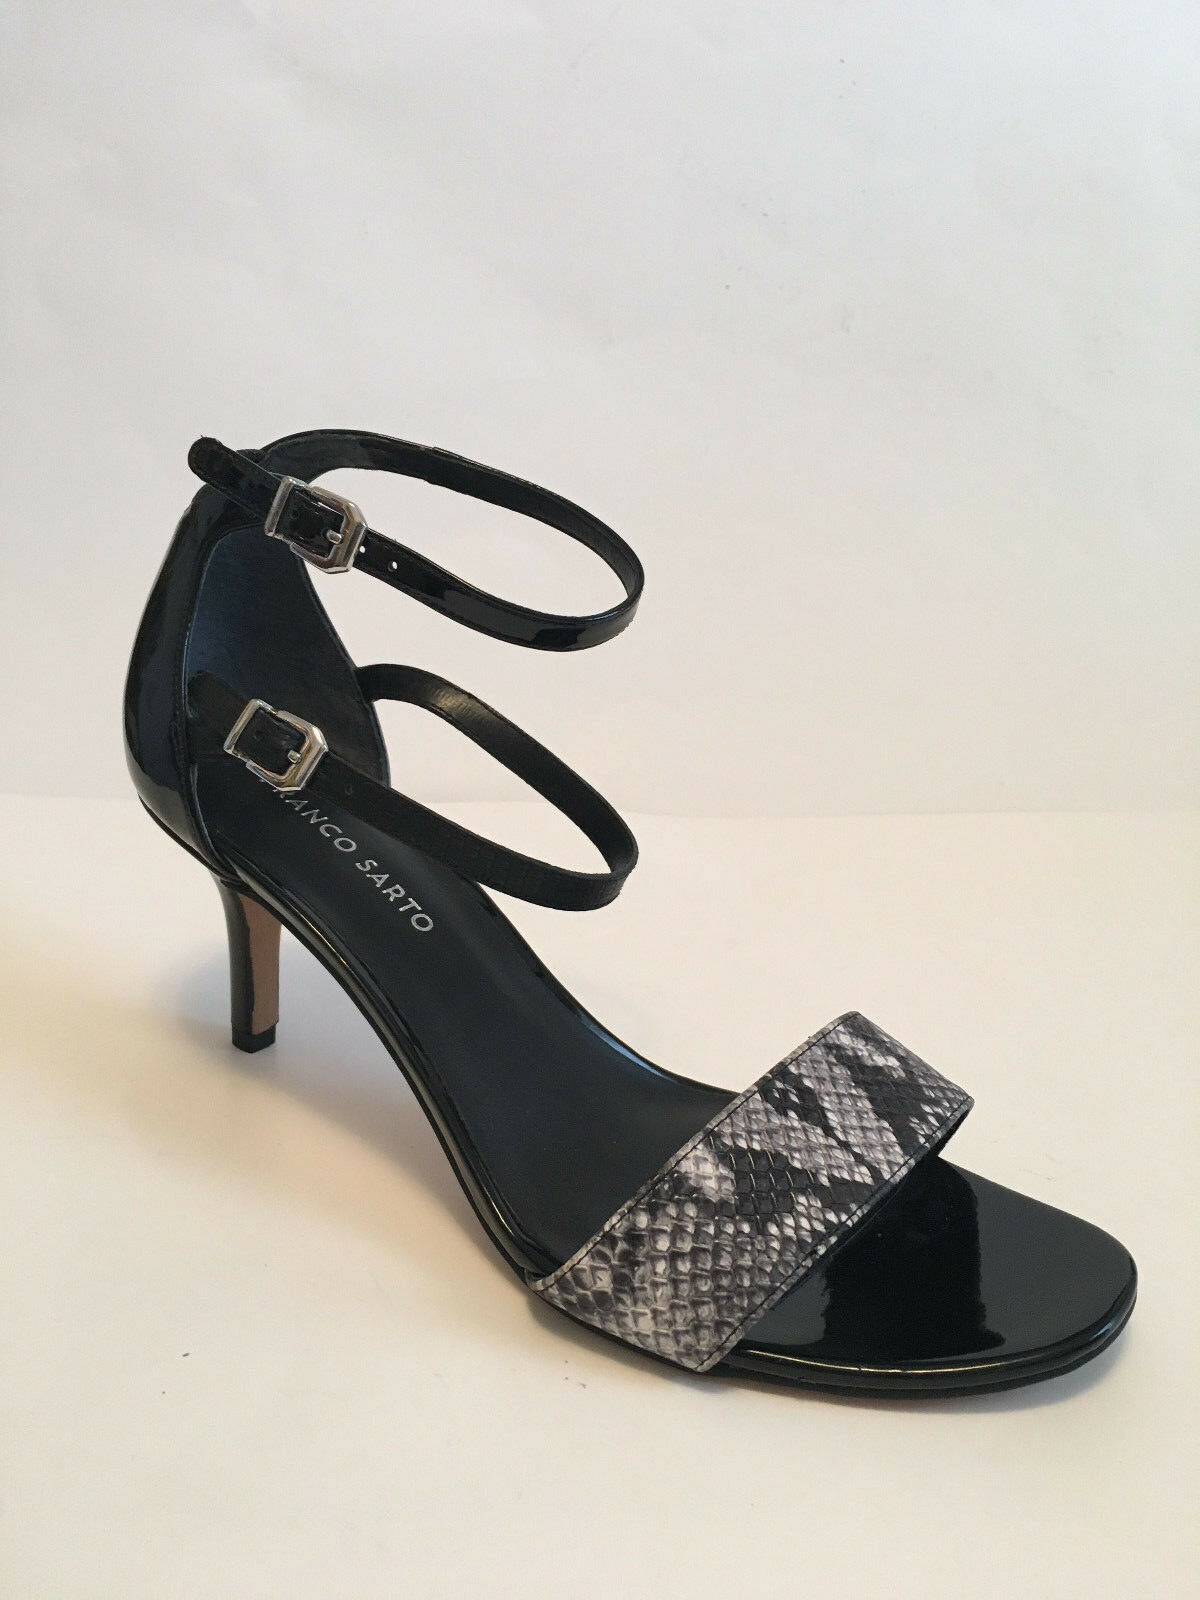 FRANCO SARTO Black patent snake high stiletto heel ankle strap sandals US Sz 10M